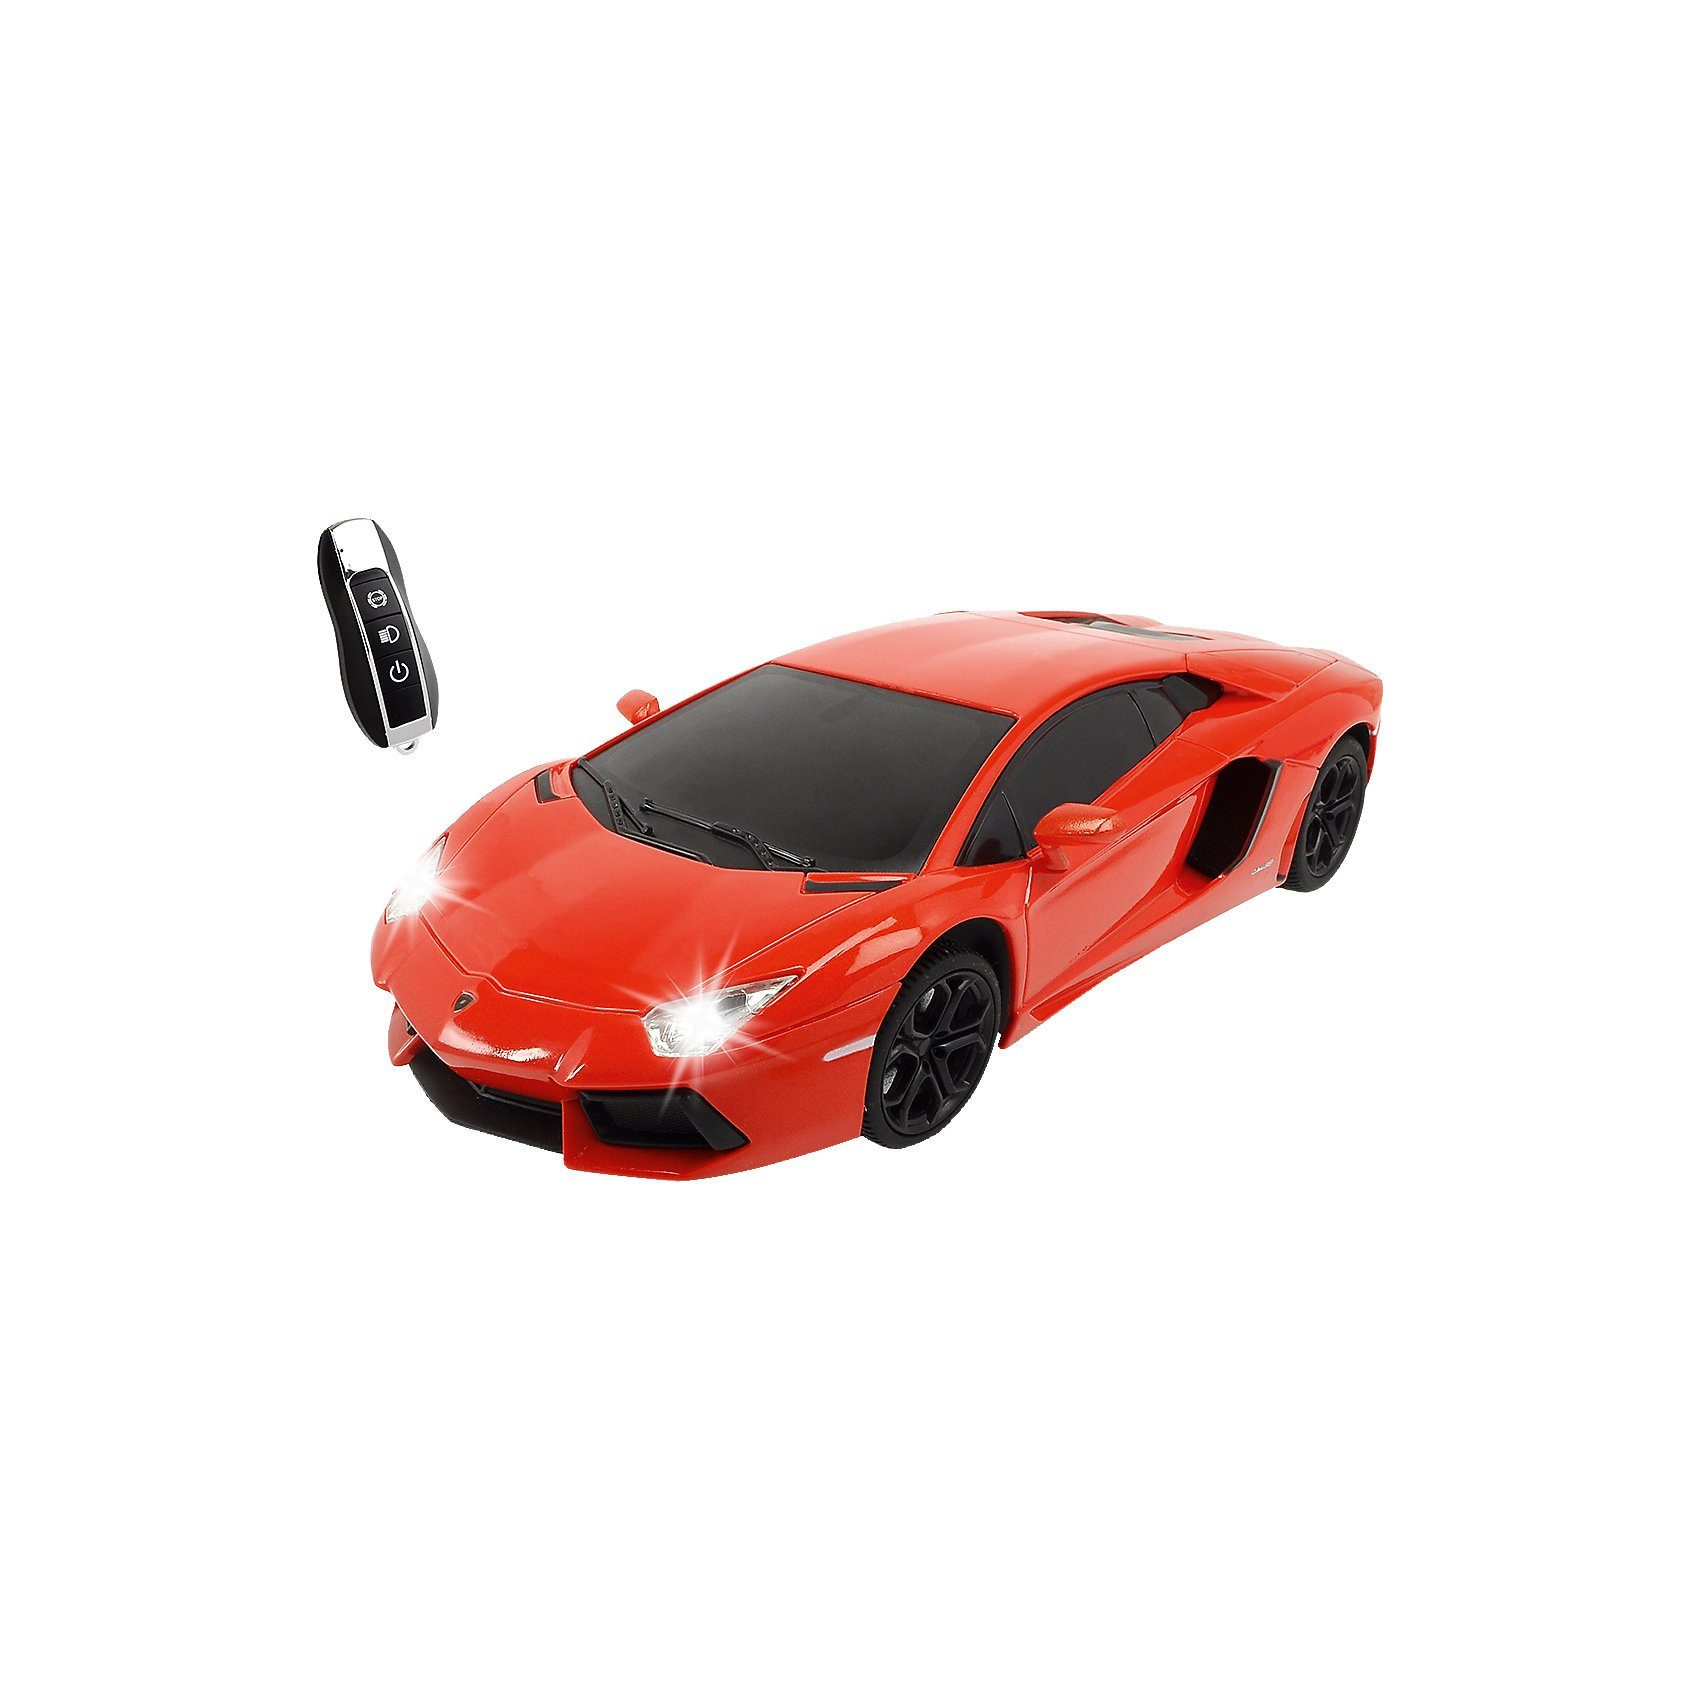 Dickie Toys RC Fahrzeug Motion Control Lamborghini